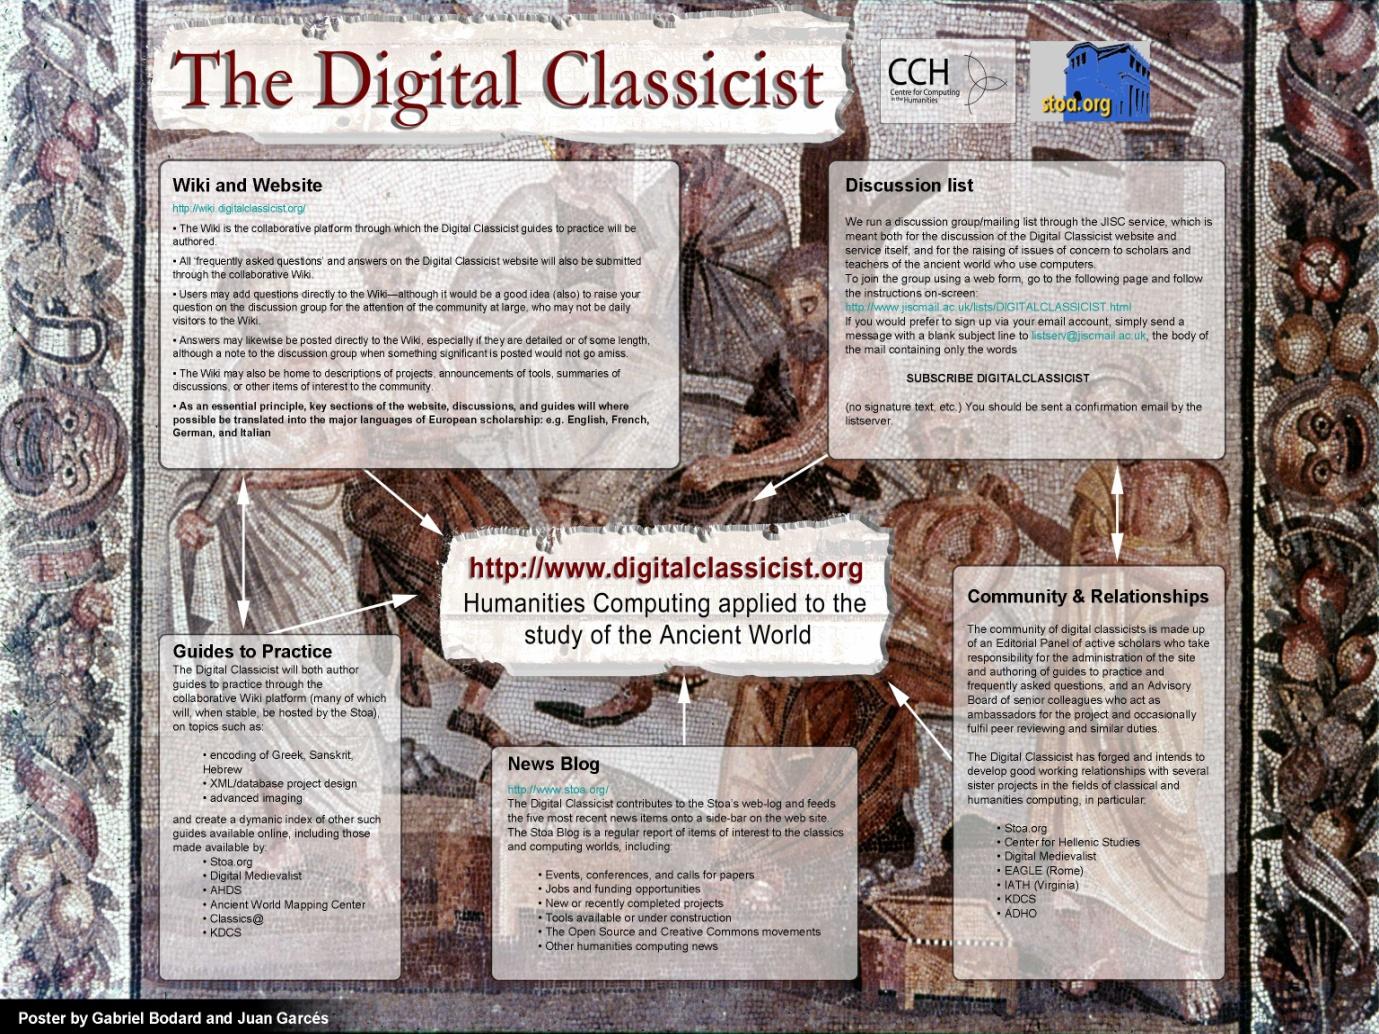 DHQ: Digital Humanities Quarterly: The Digital Classicist: building